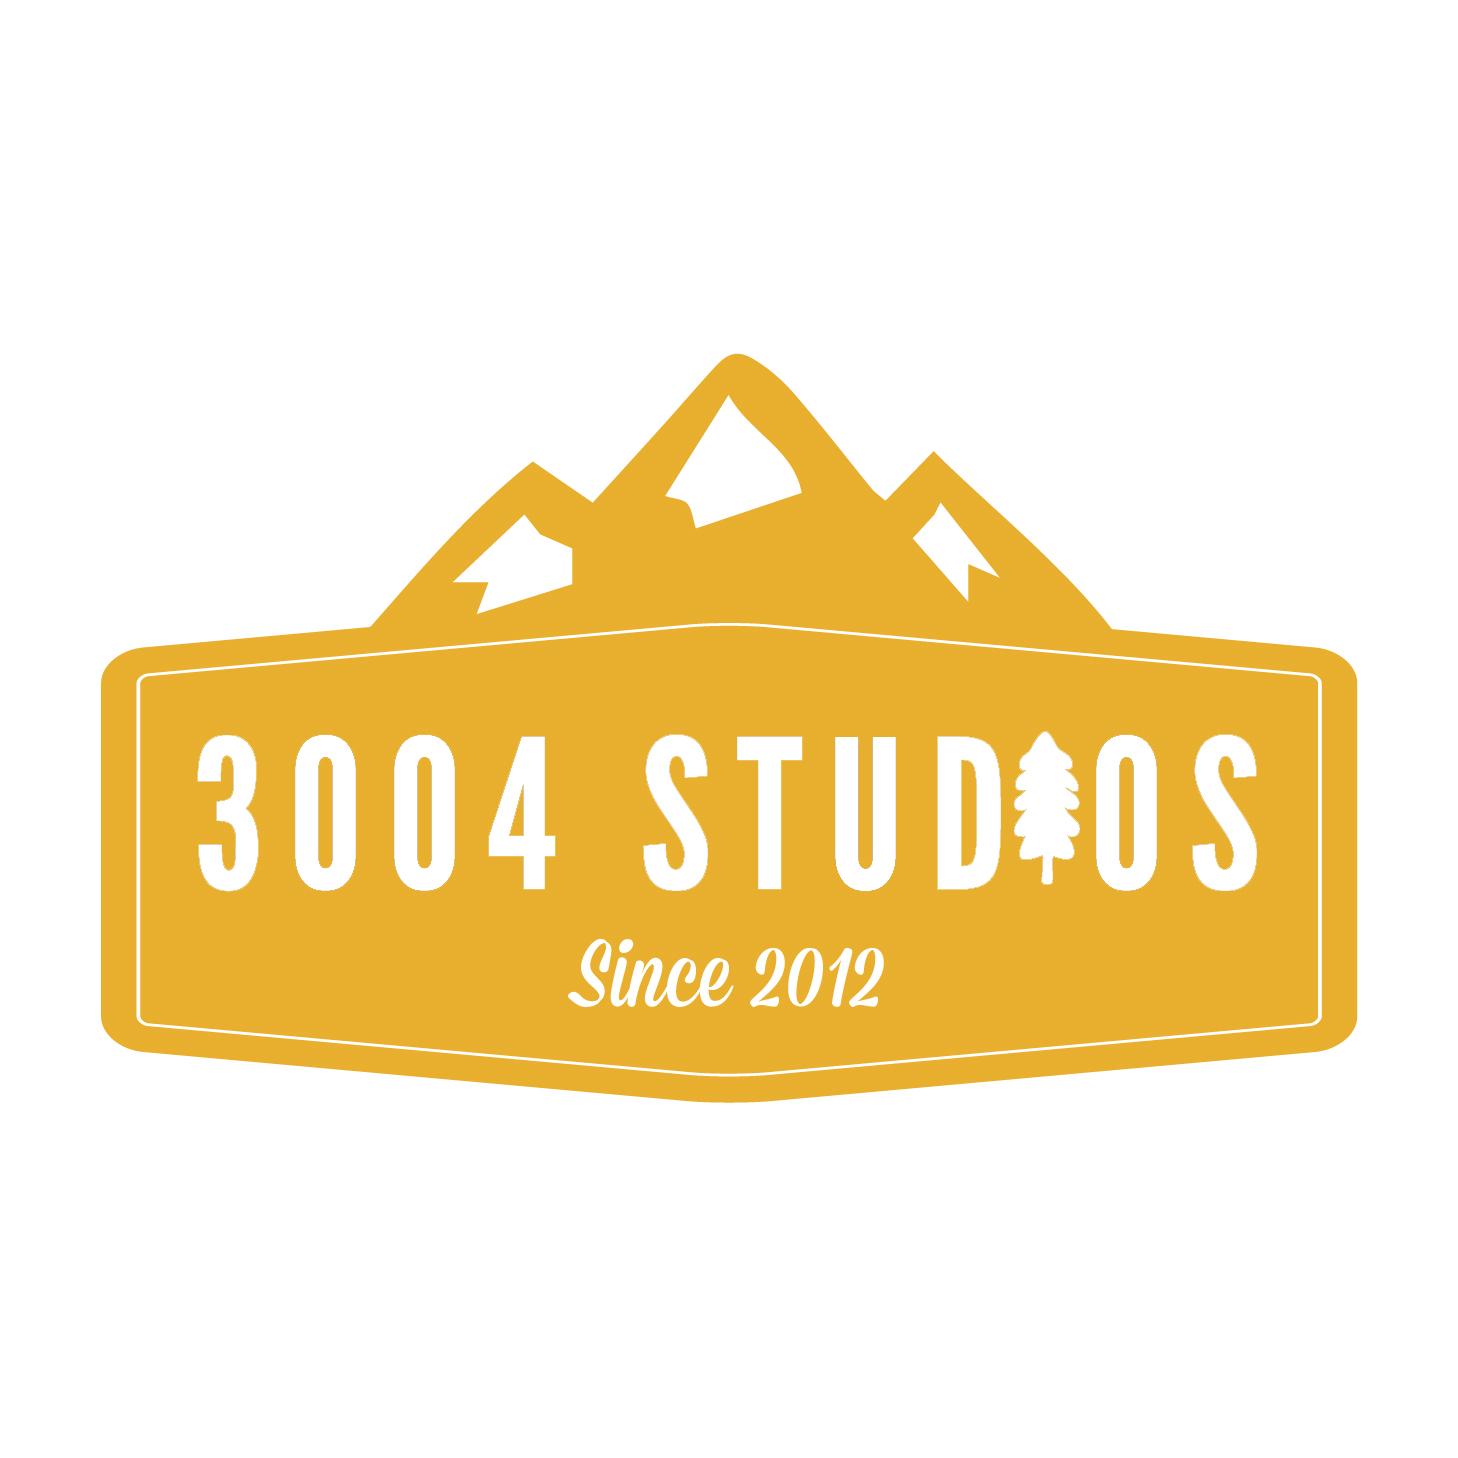 3004 Studios